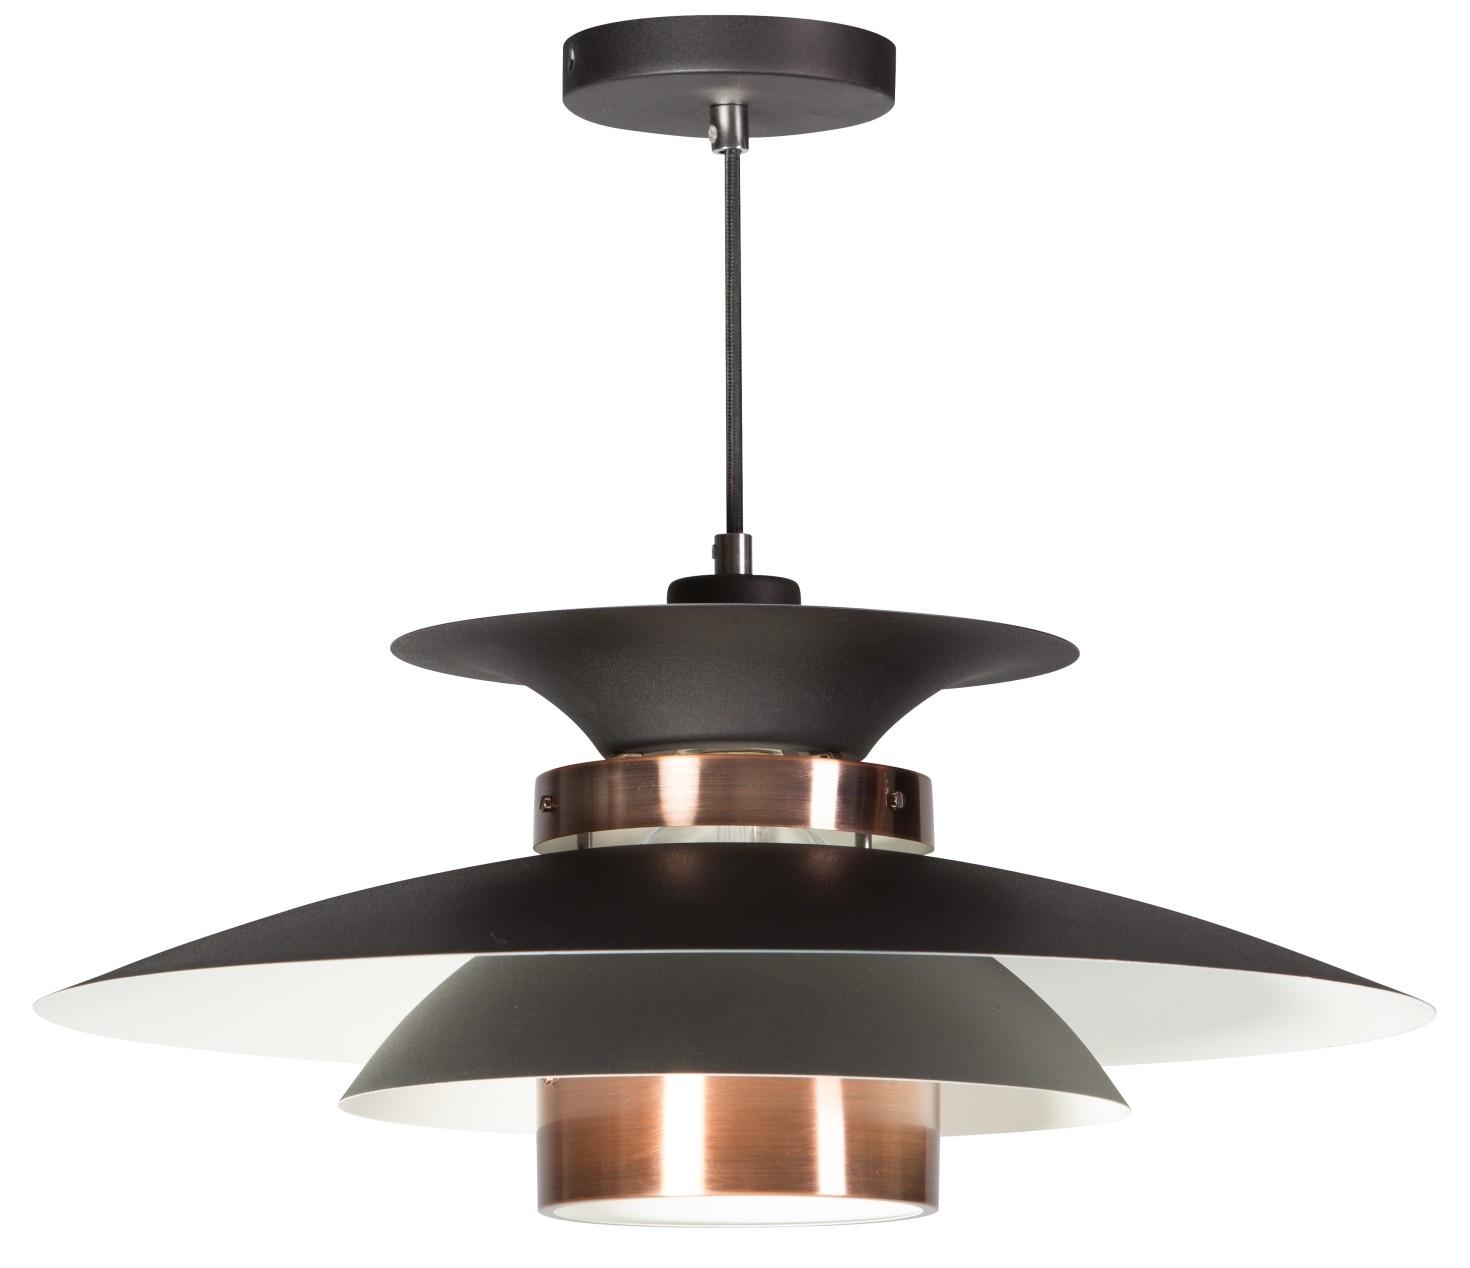 ETH Hanglamp Potenza -Ø50 Cm - Zwart - Koper